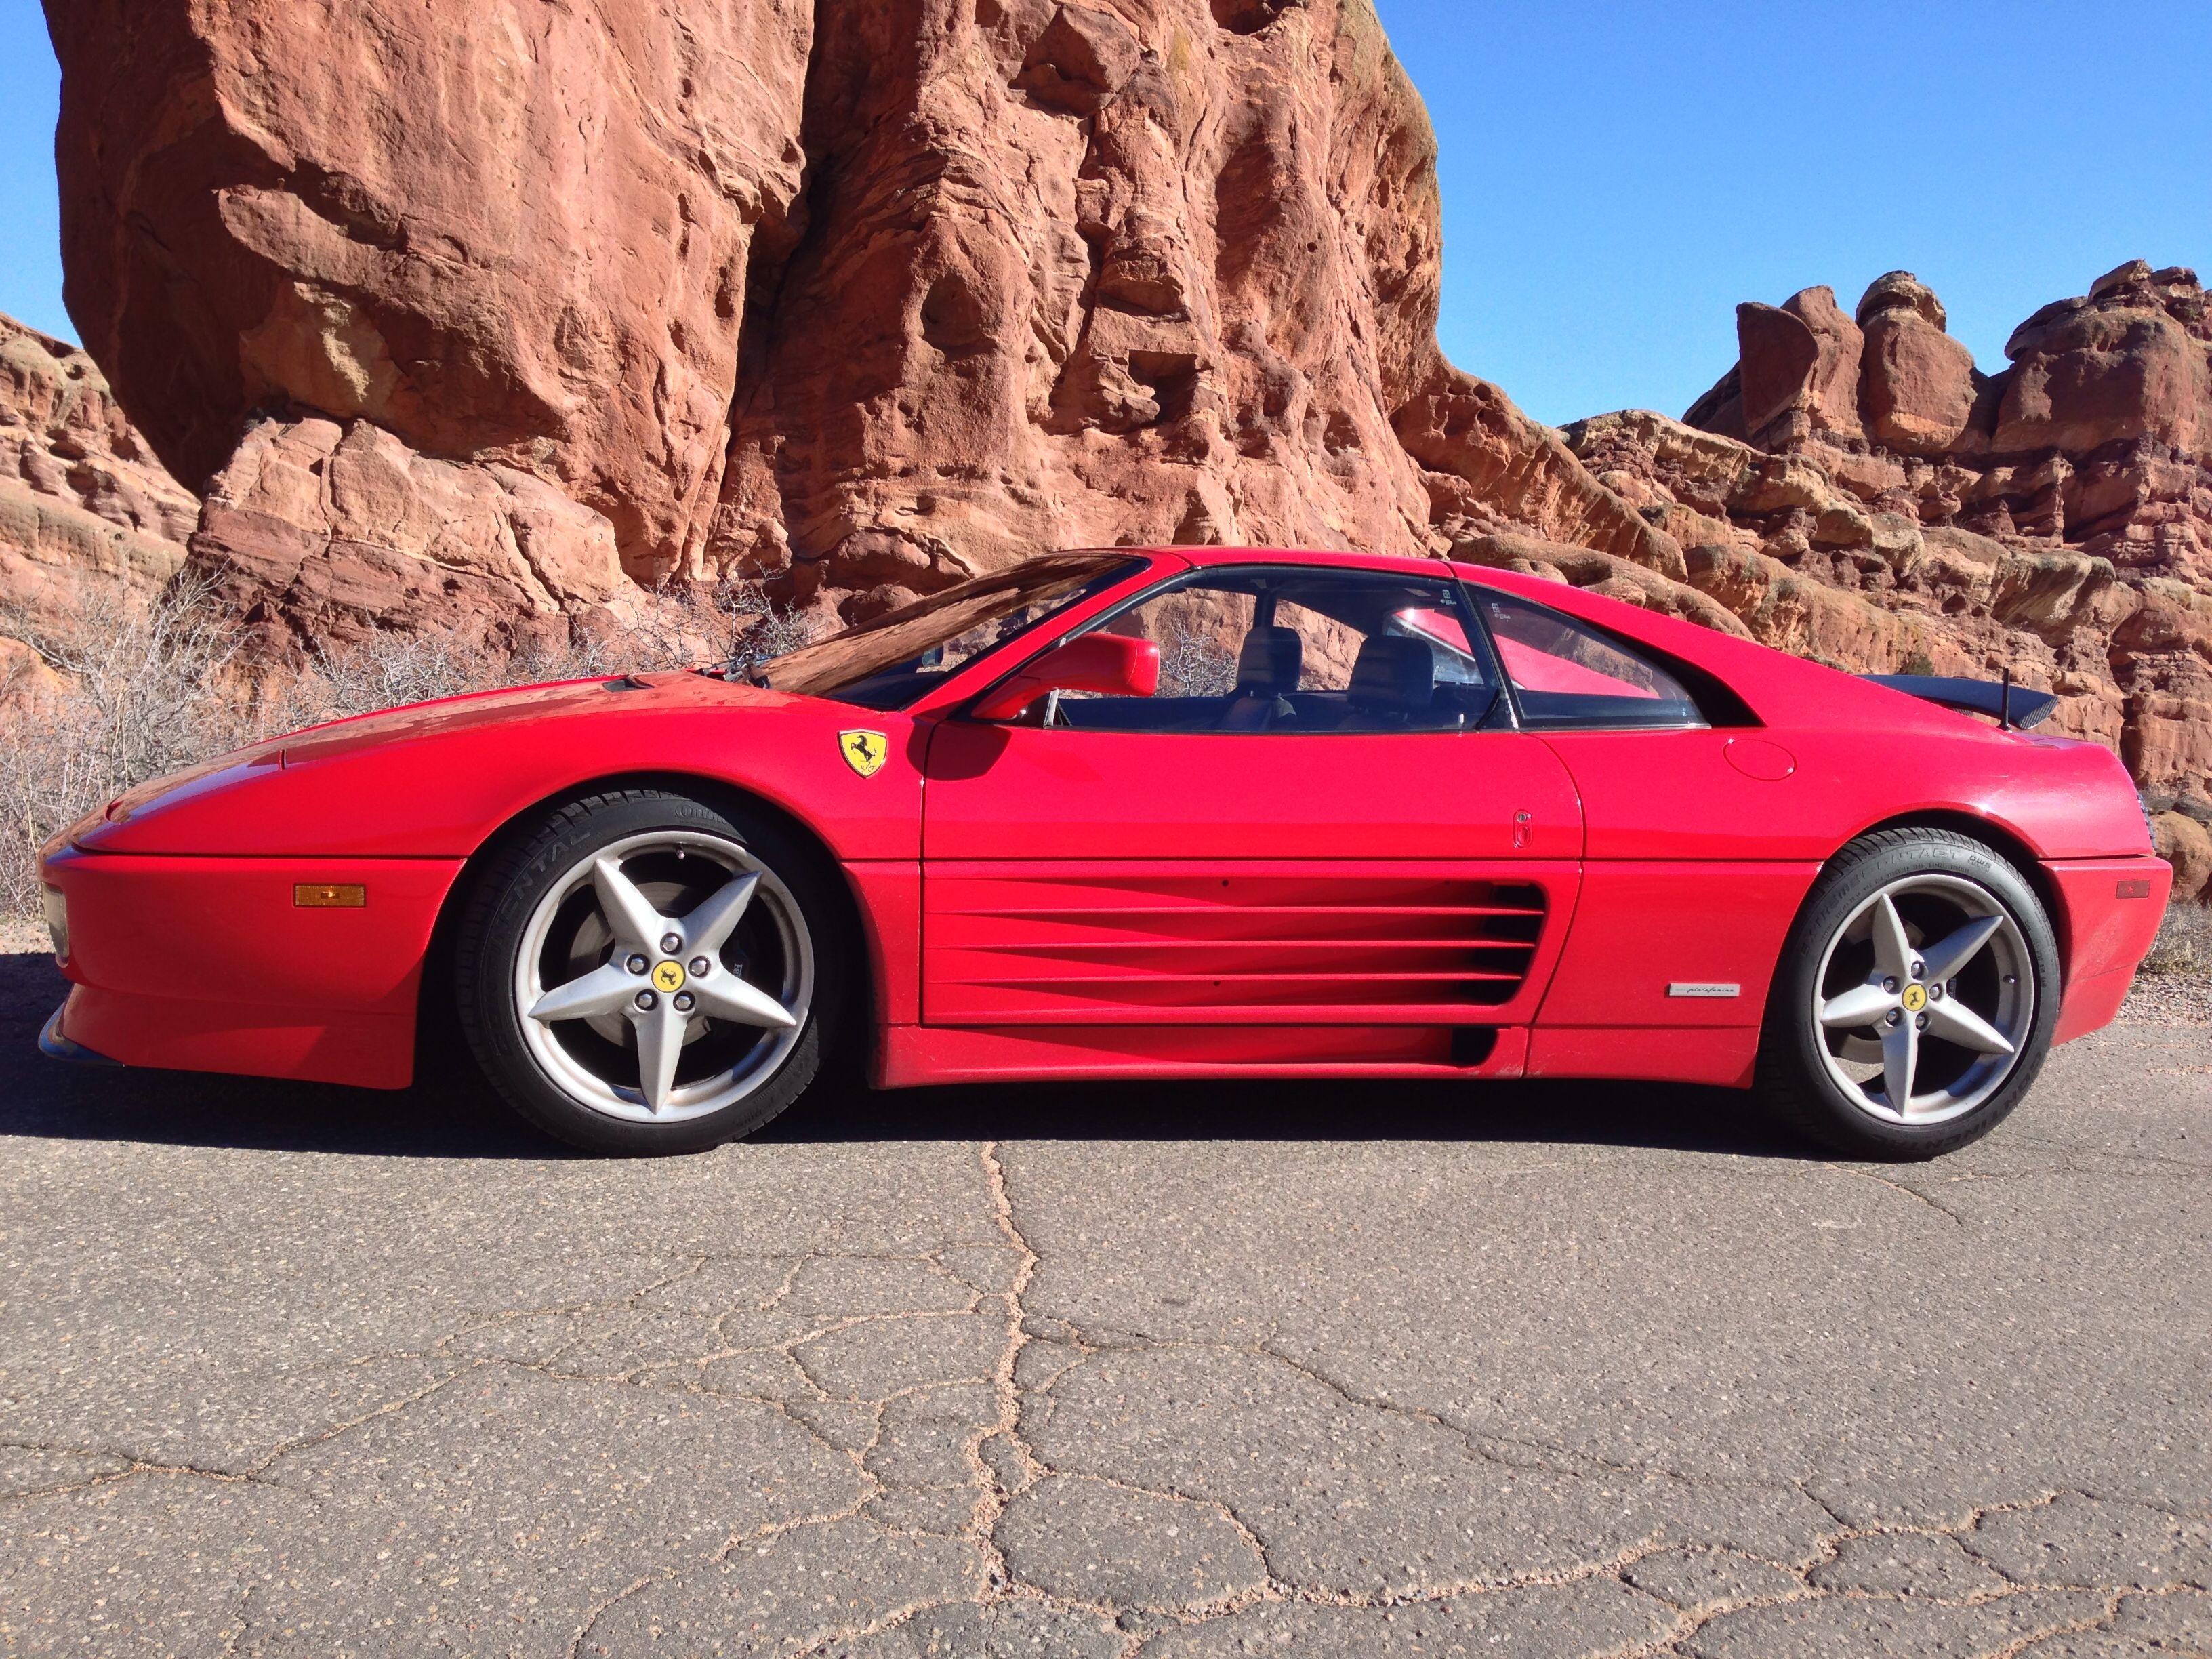 Ferrari 348: specifications and description of the legendary Italian sports car